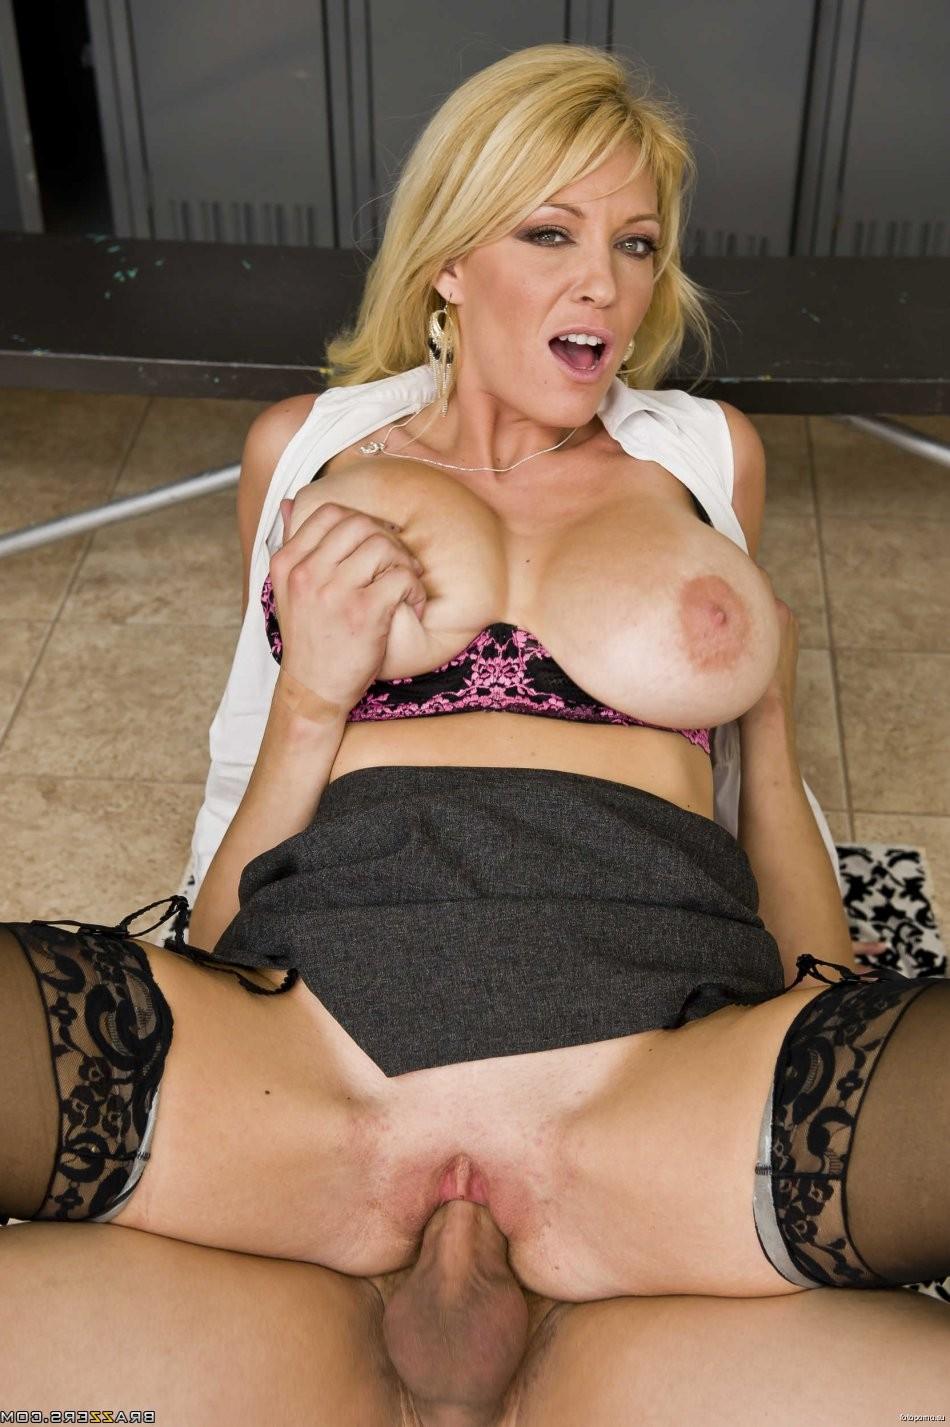 bubble butt blonde threesome – BDSM